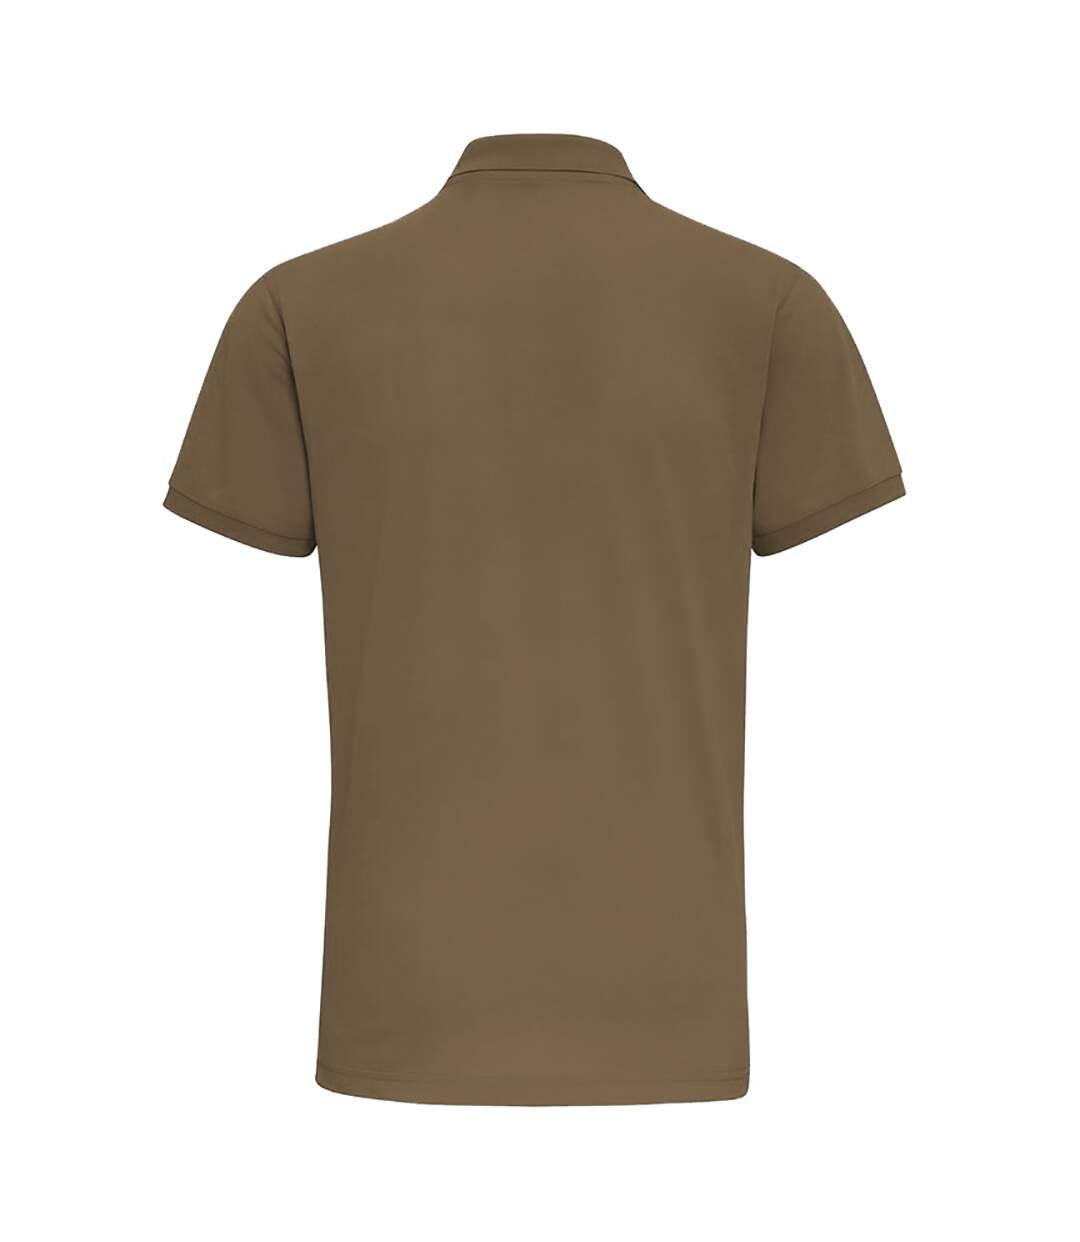 Asquith & Fox Mens Short Sleeve Performance Blend Polo Shirt (Slate) - UTRW5350